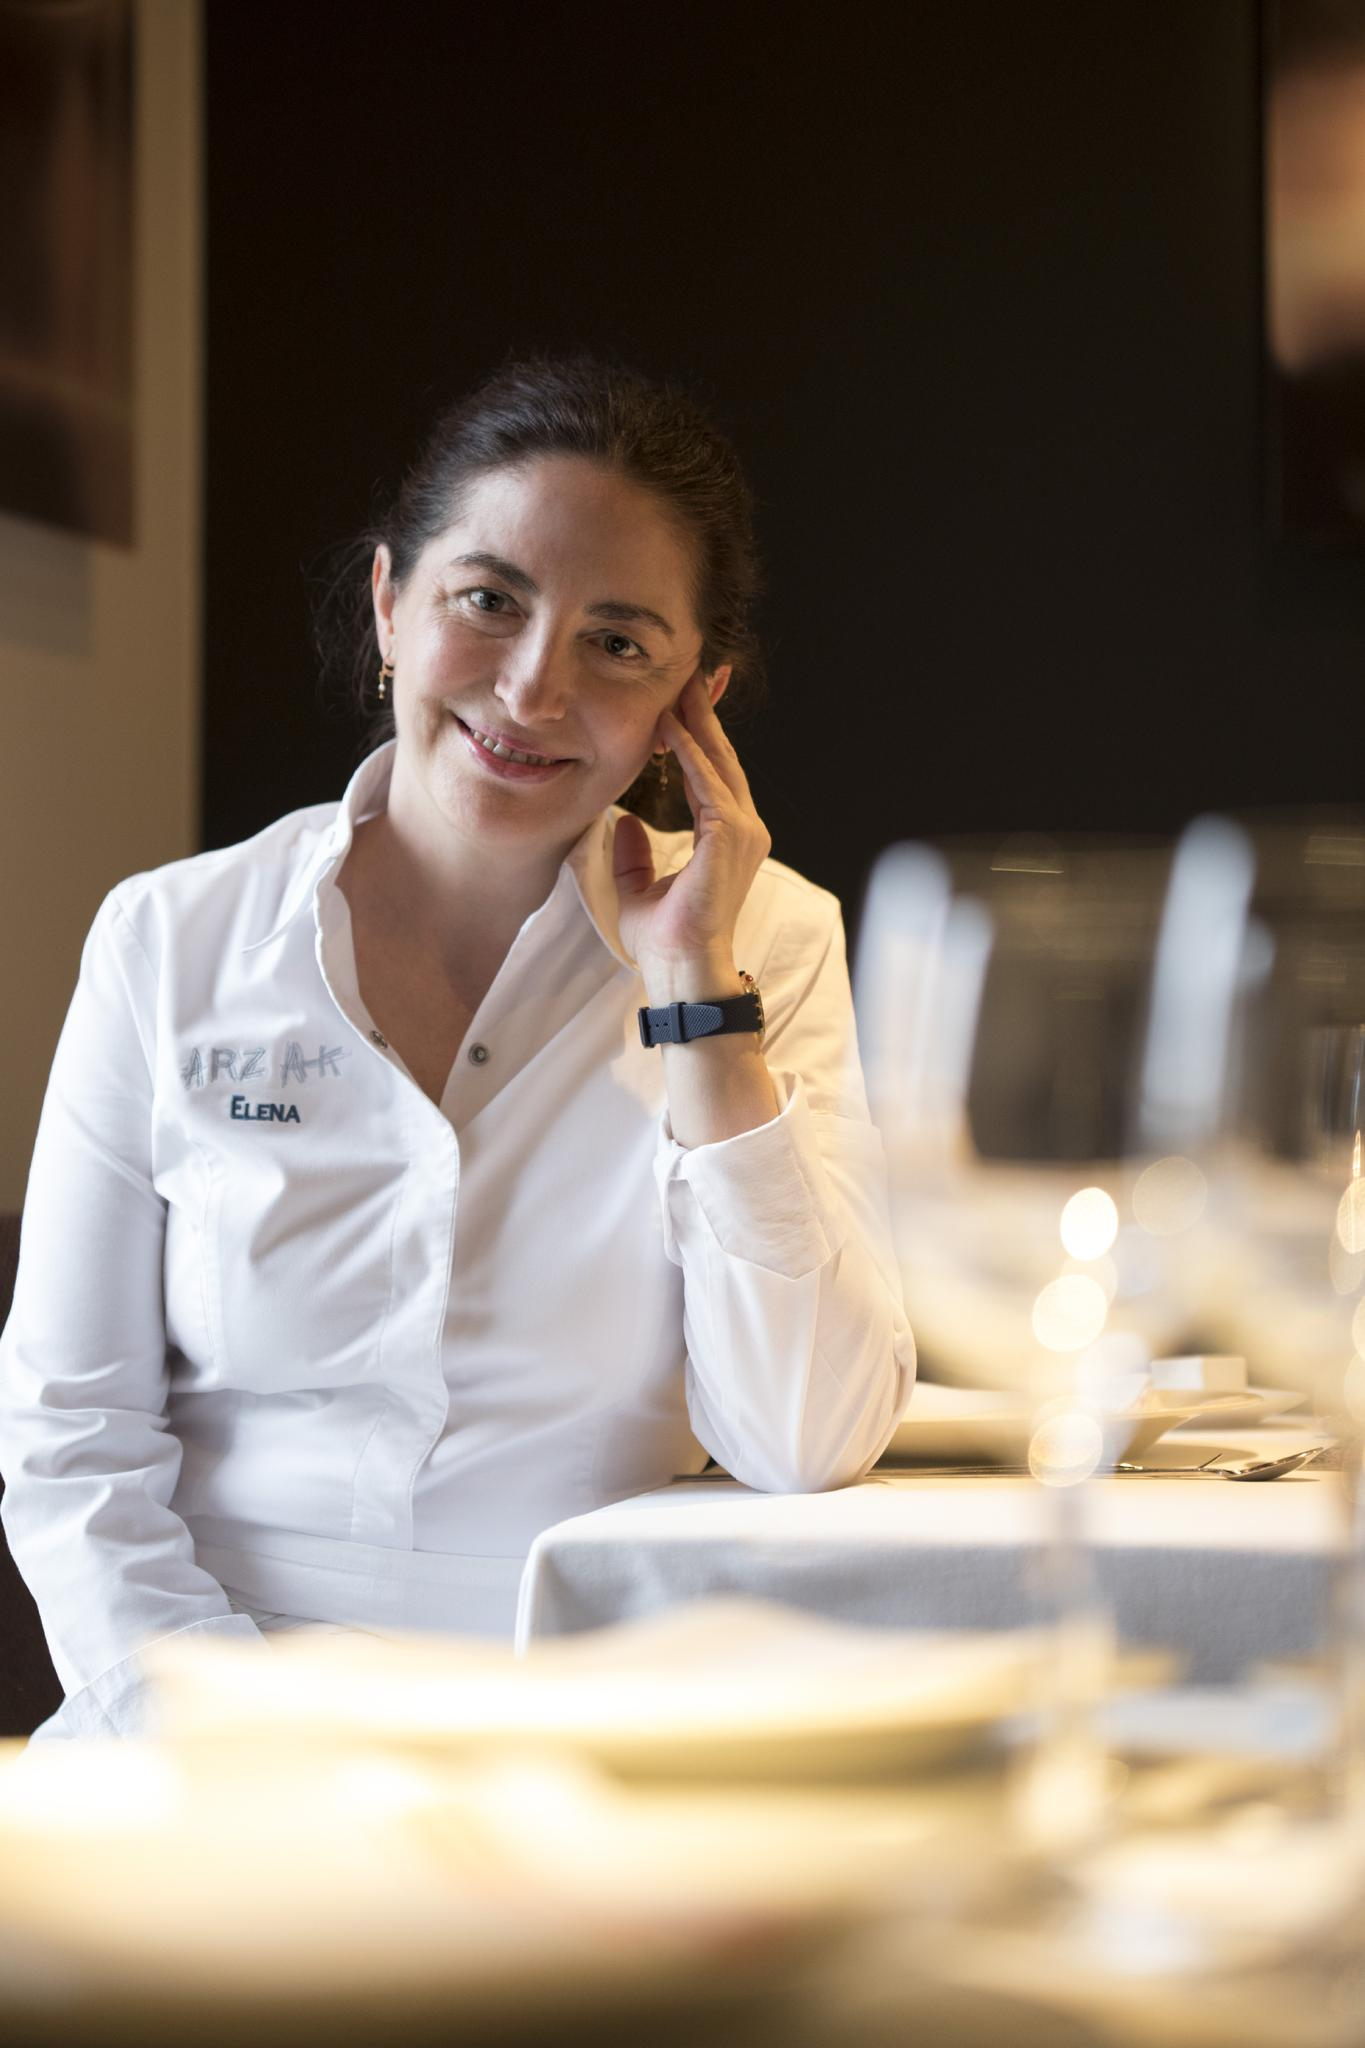 Chef Elena Arzak